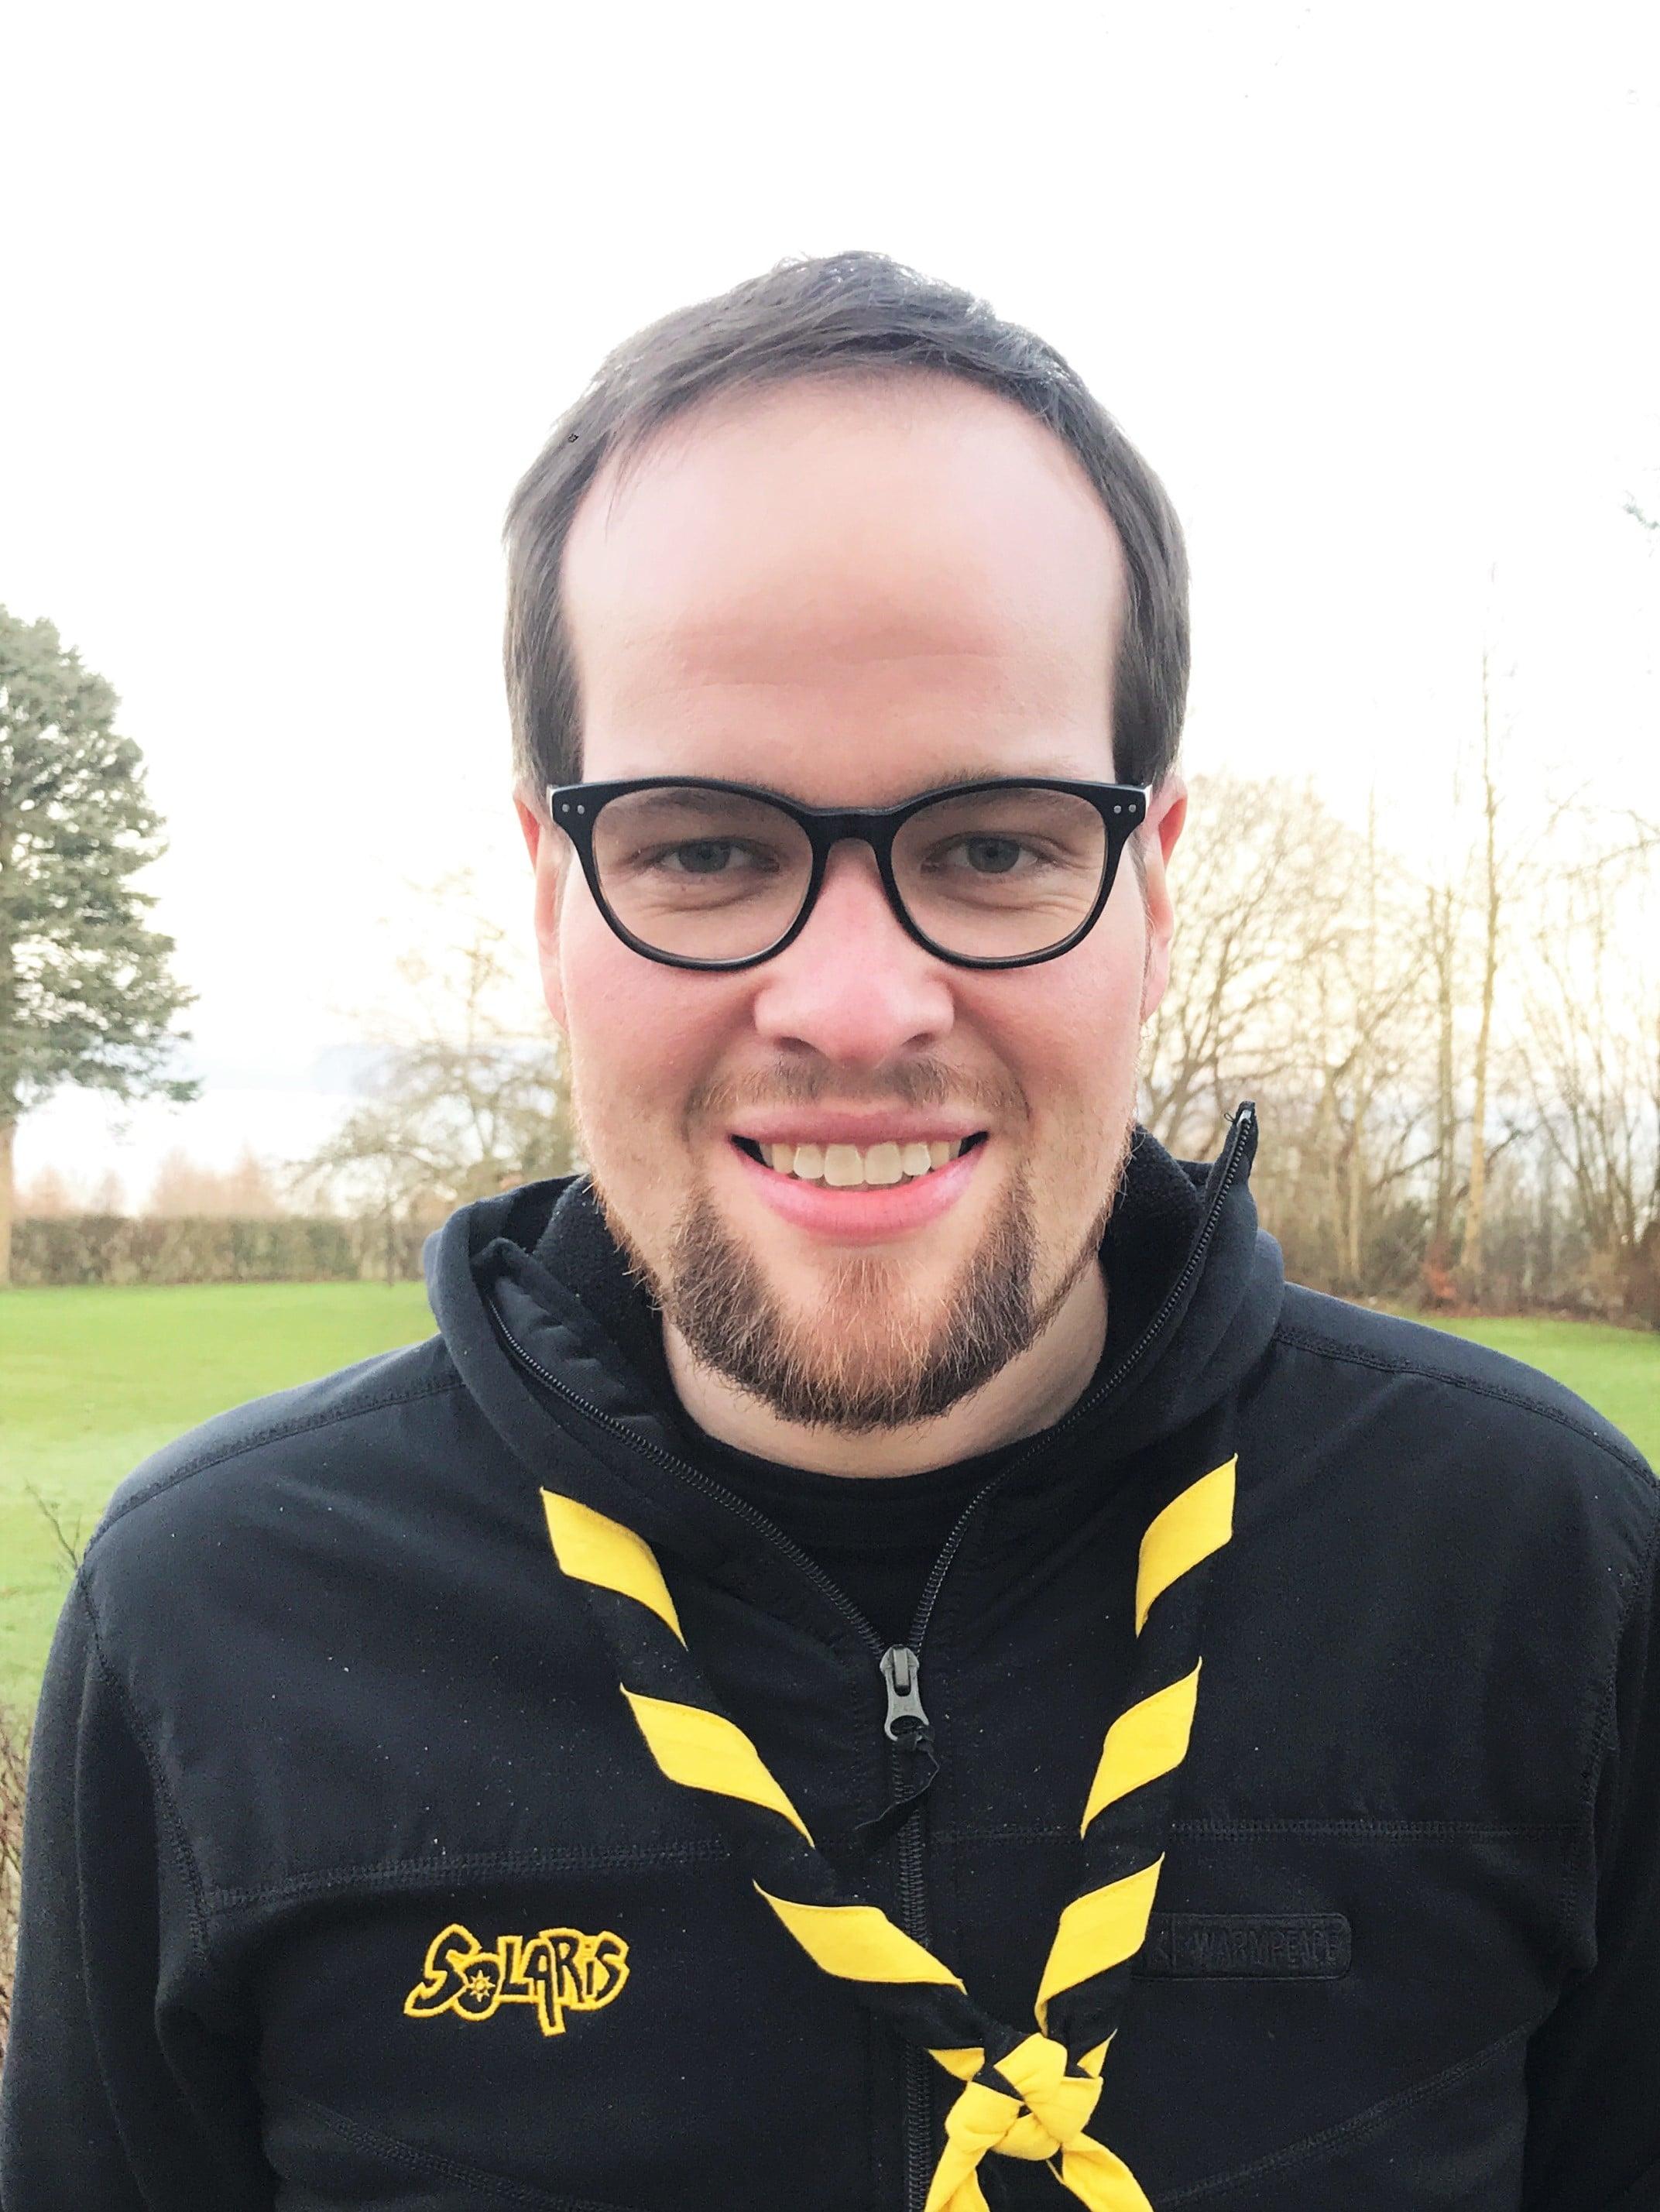 Kristoffer Hedemann Roed Knudsen